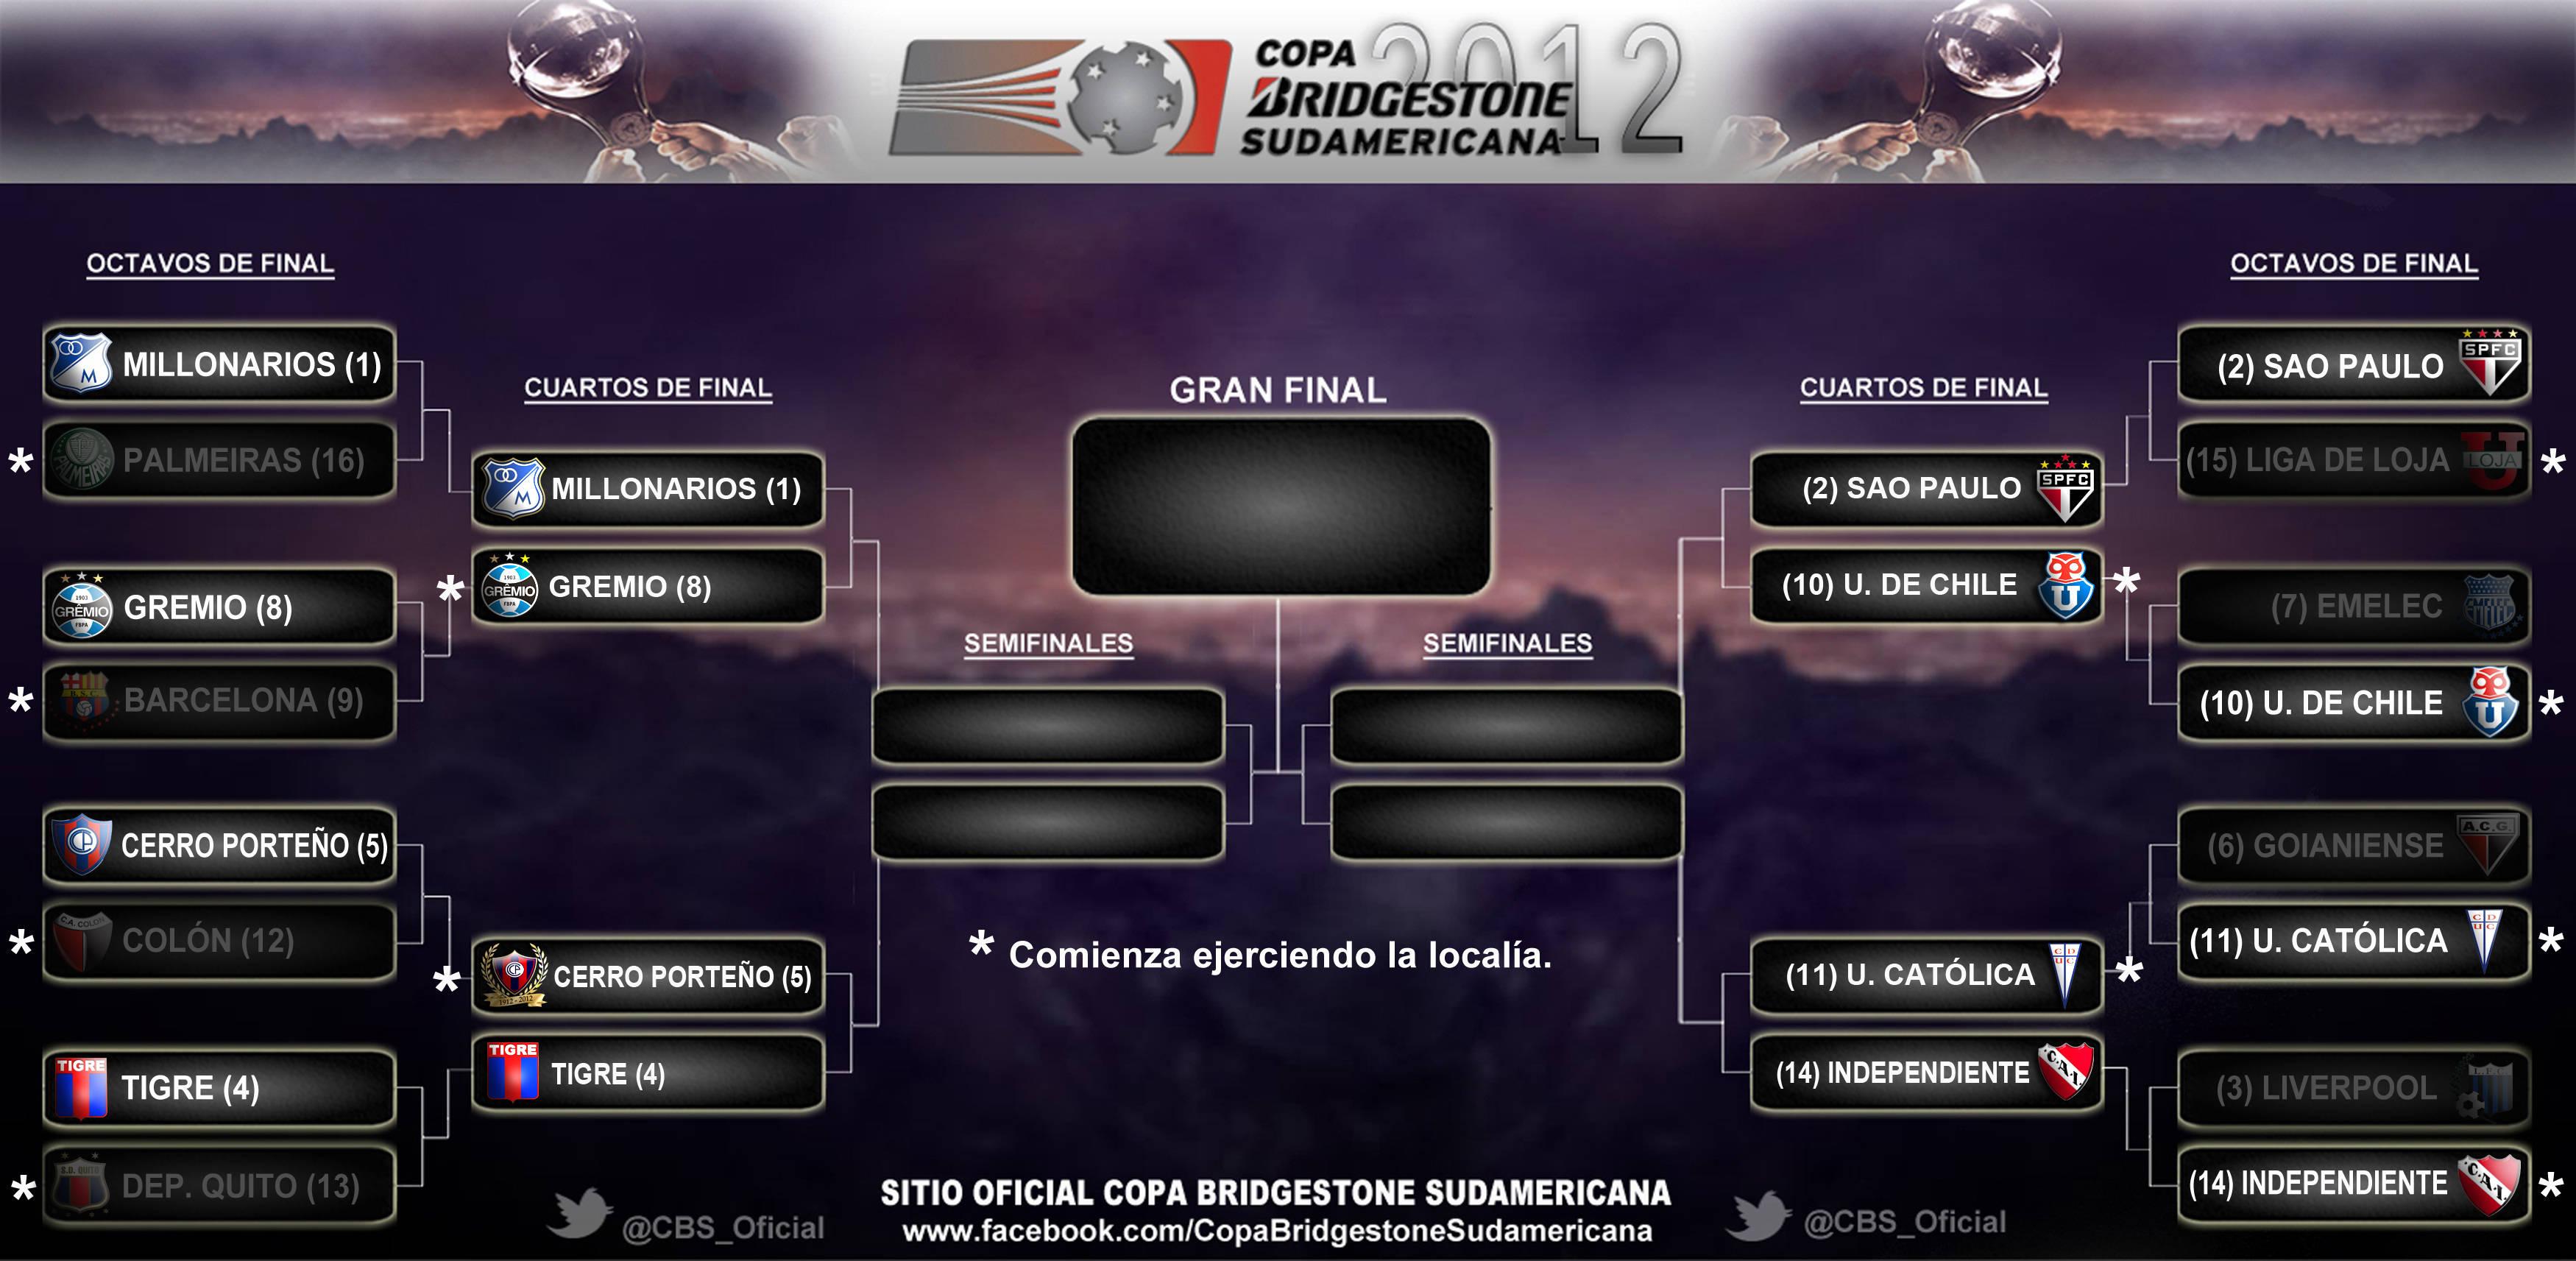 cuartosdefinal